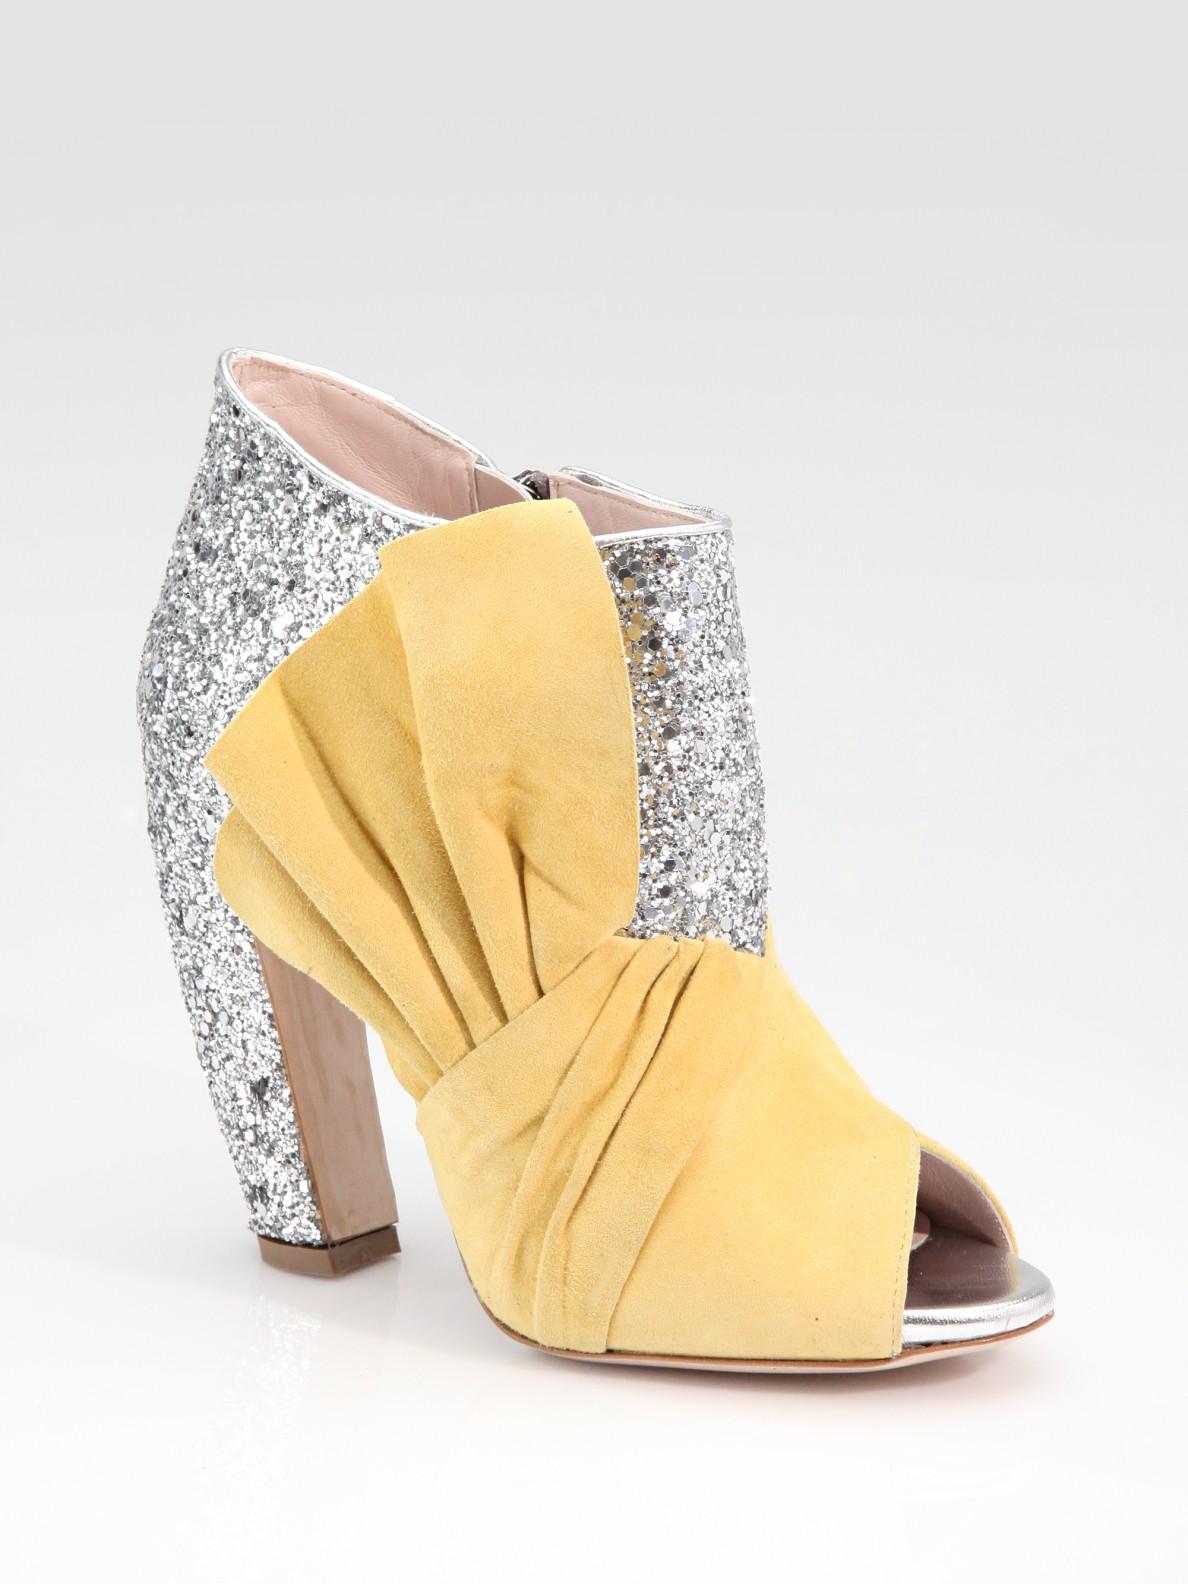 c7bb6f04475b Lyst - Miu Miu Glitter   Suede Bow Peep Toe Ankle Boots in Yellow